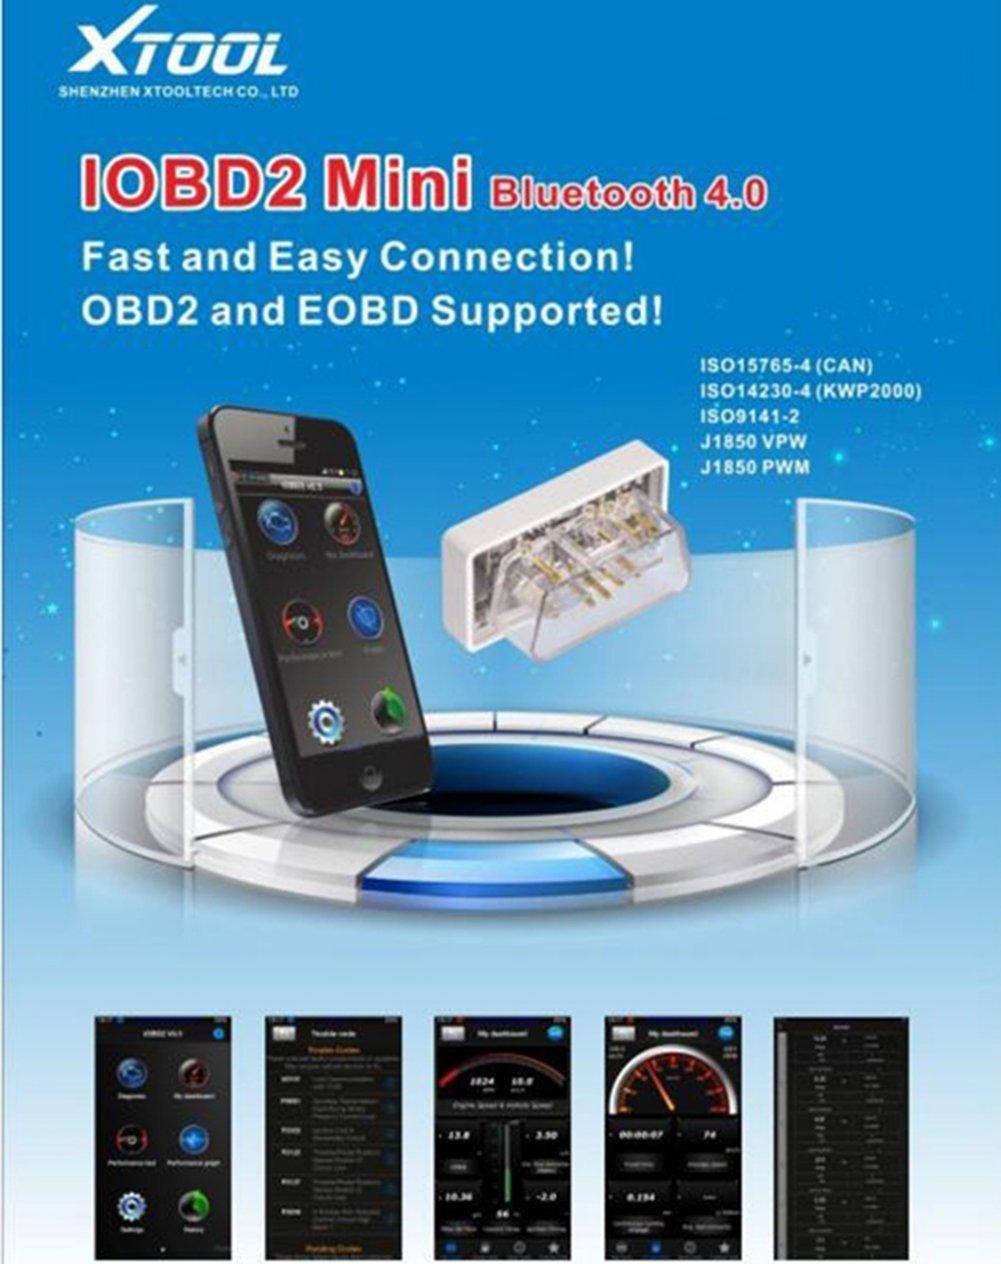 Neue Produkt Gute Funktion Original xTOOL iOBD2 Mini unterstützt ...